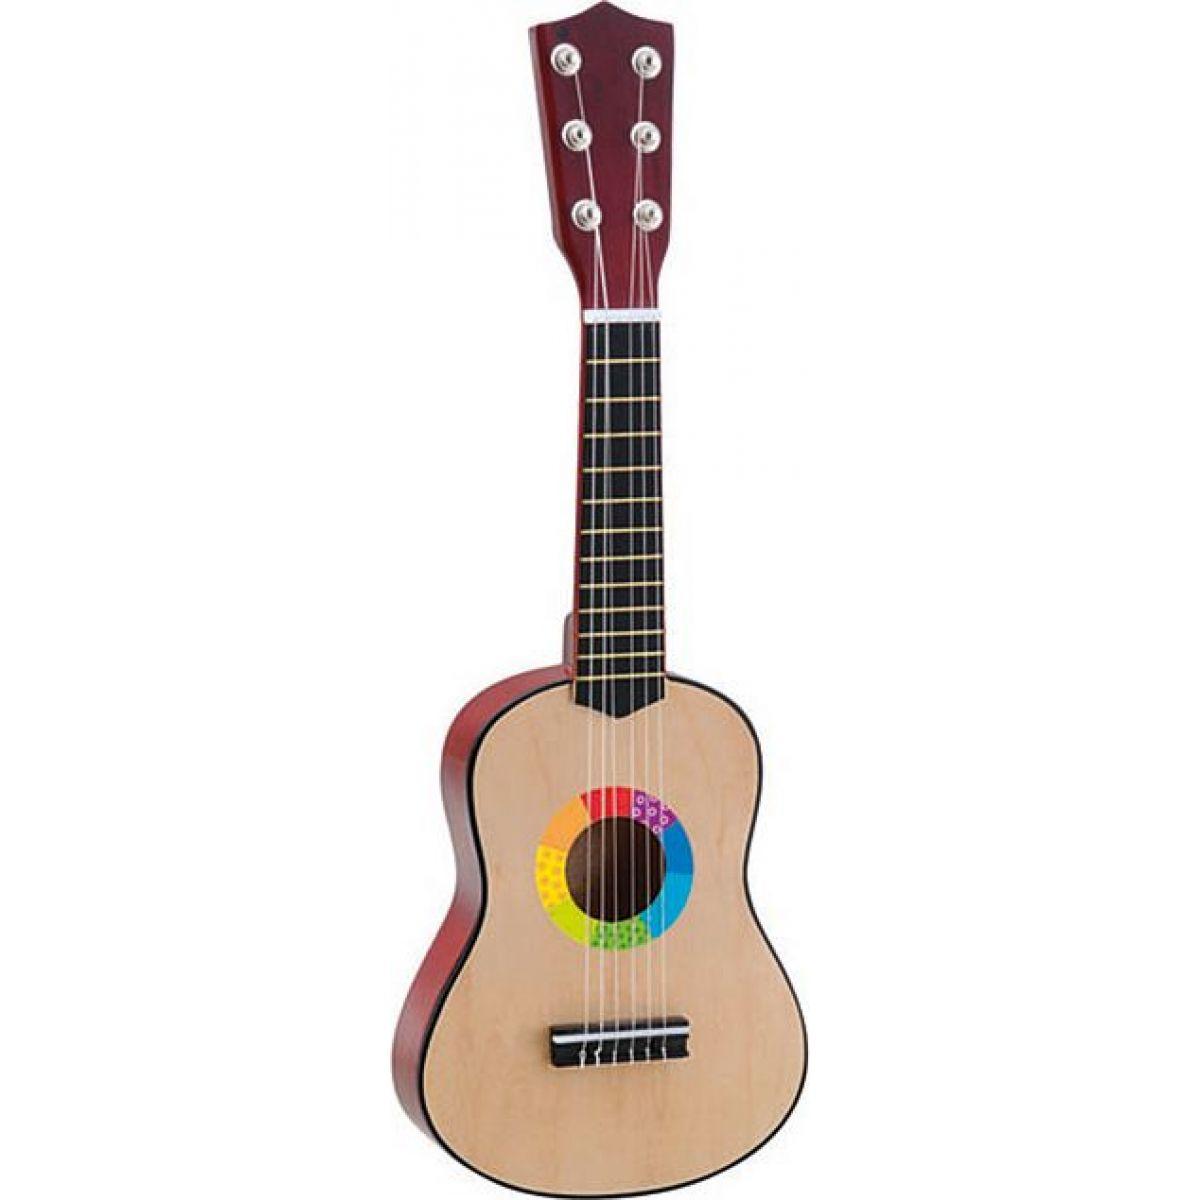 Woody Gitara plastová 52 cm